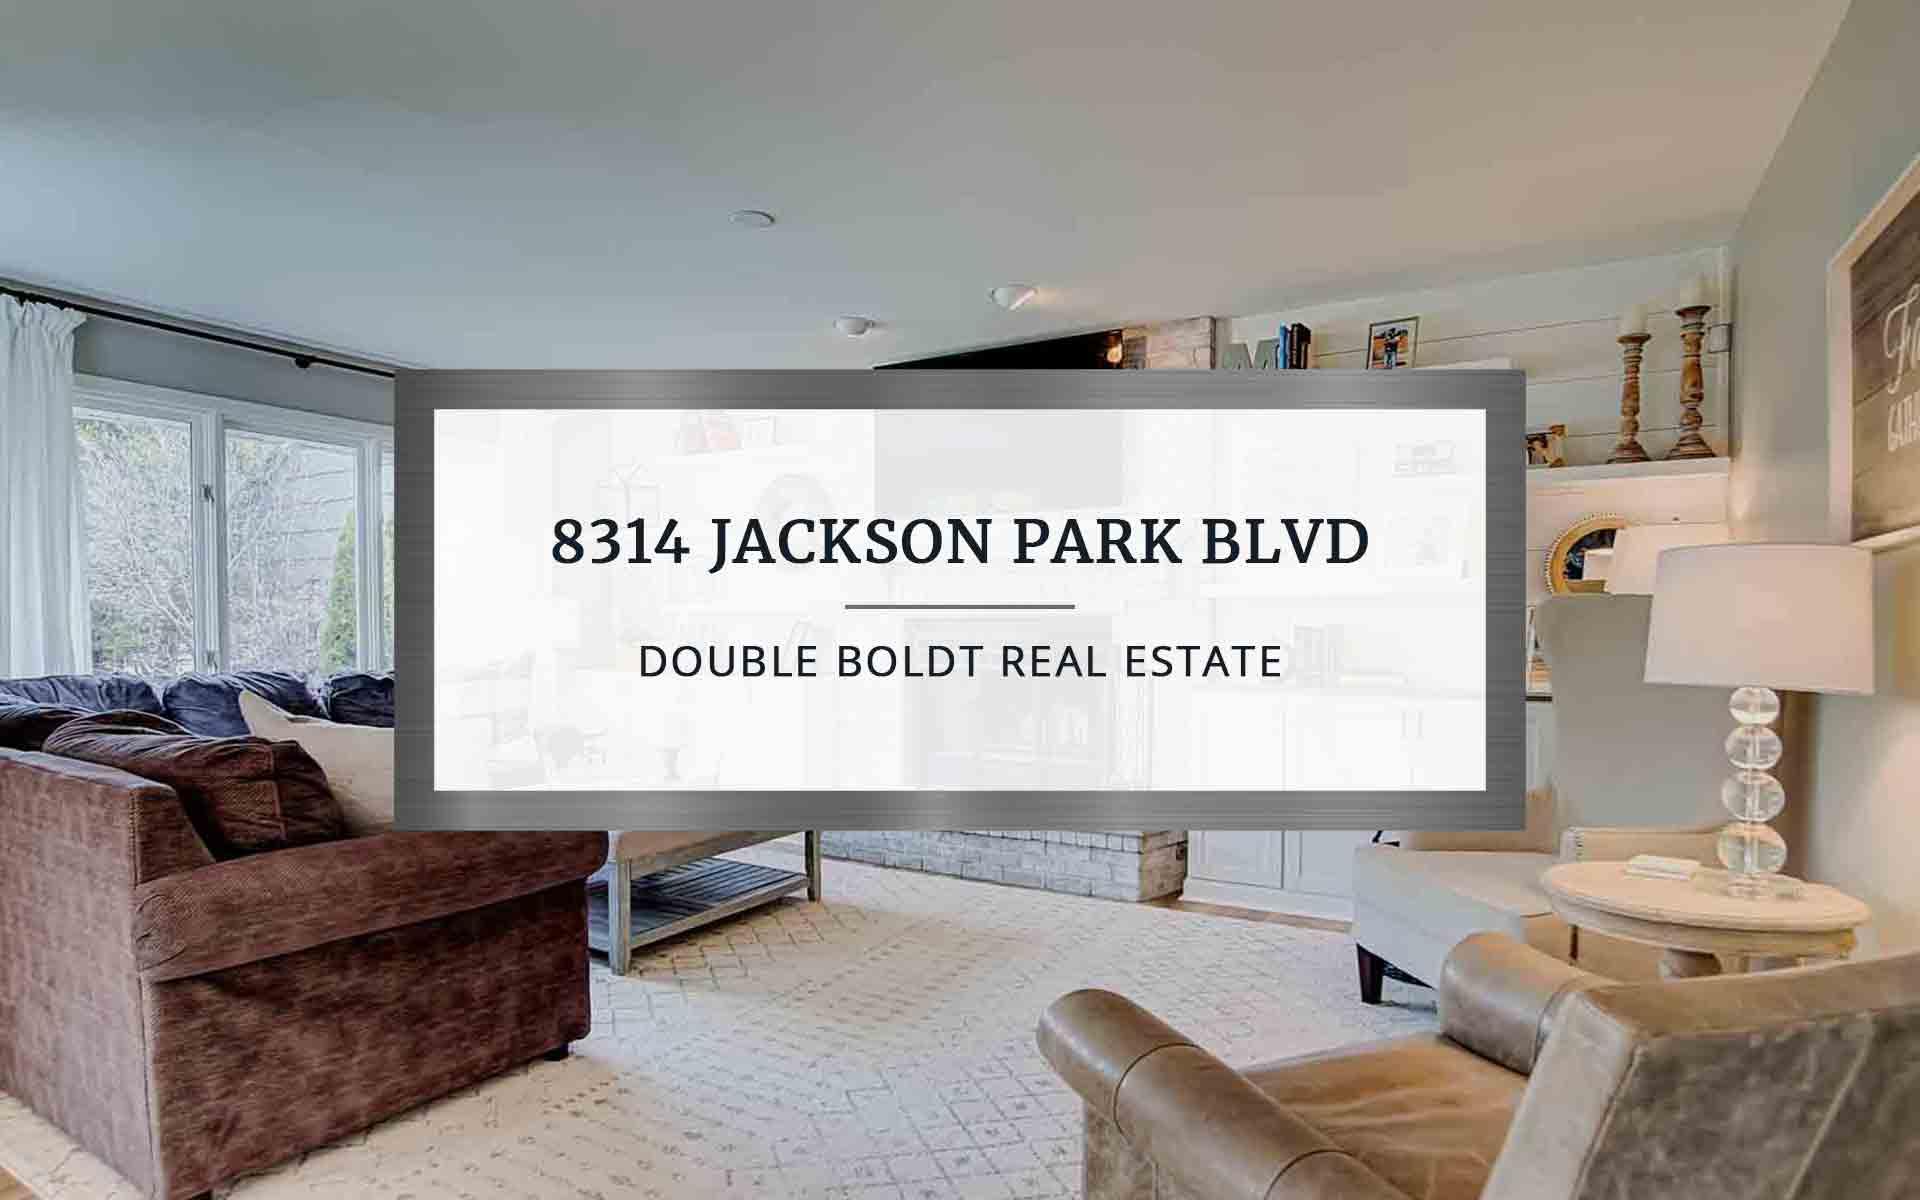 8314 Jackson Park Blvd | Double Boldt Real Estate